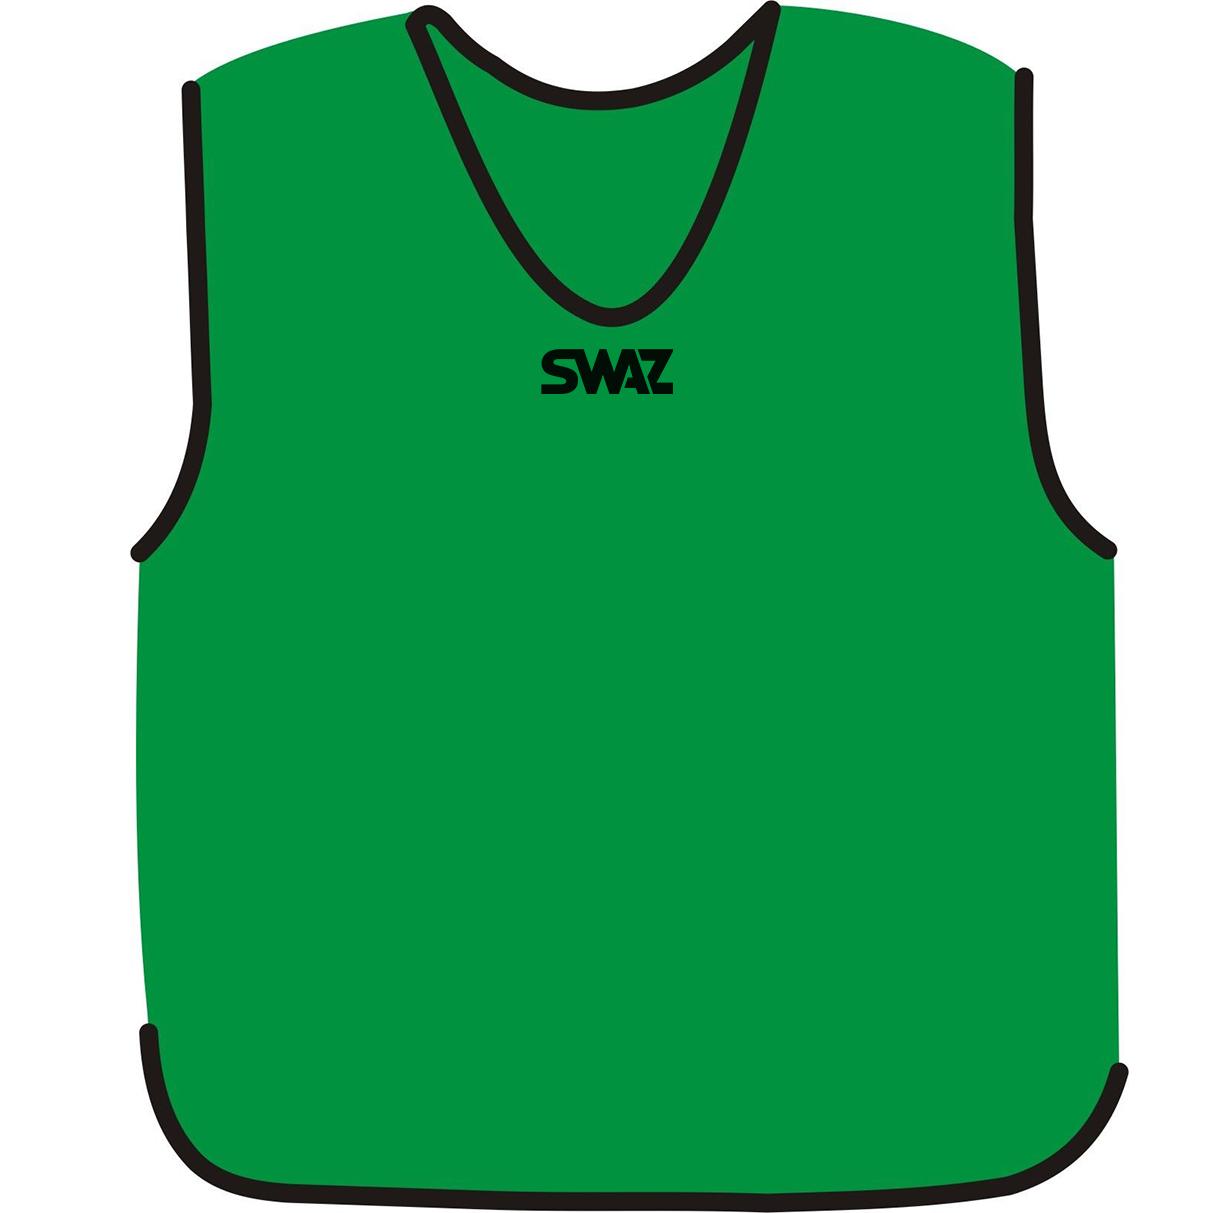 15 SWAZ Training Bibs – Green